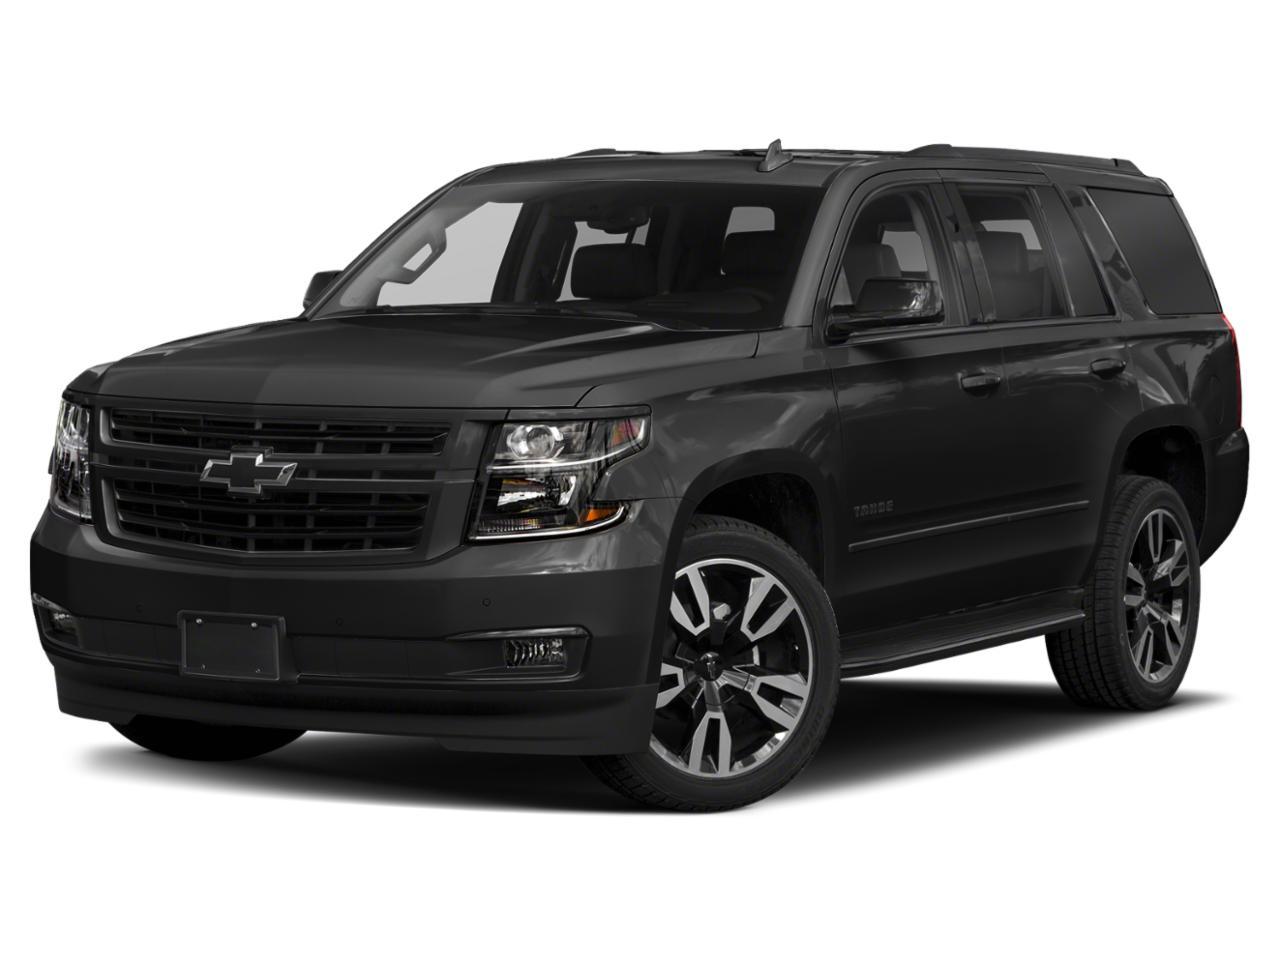 Black 2020 Chevrolet Tahoe PREMIER SUV Wake Forest NC